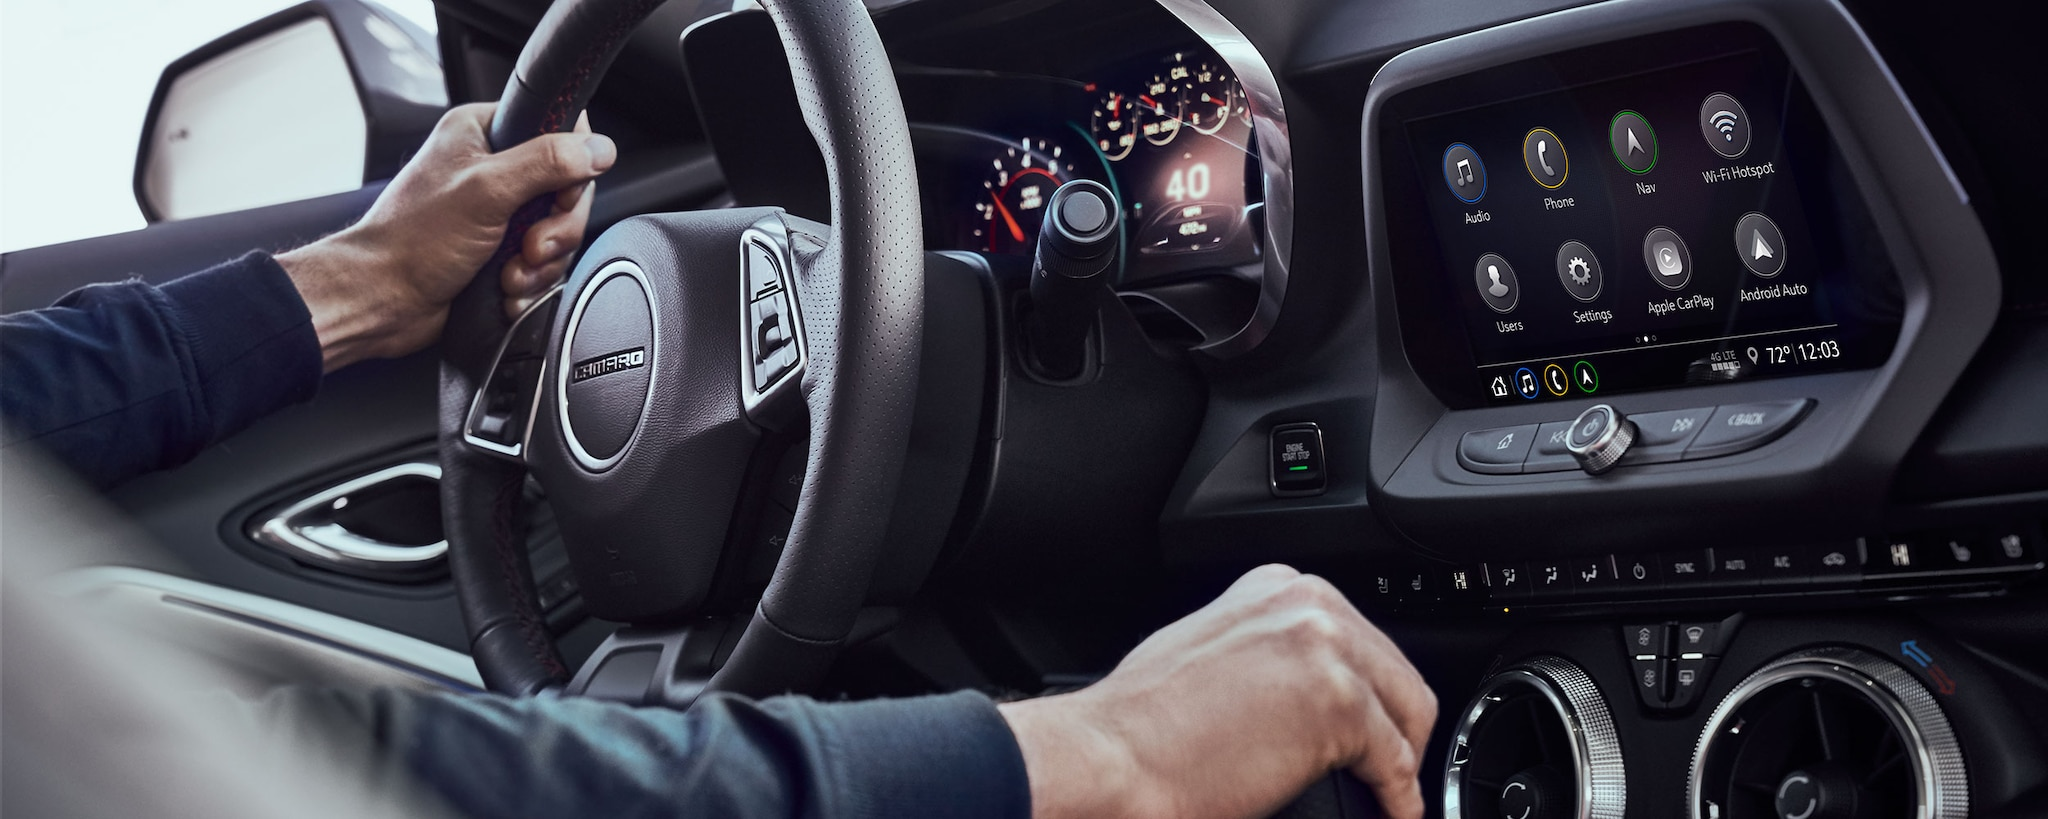 Foto del interior del Camaro 2019: Interior del 3LT Coupe con pantalla de infoentretenimiento